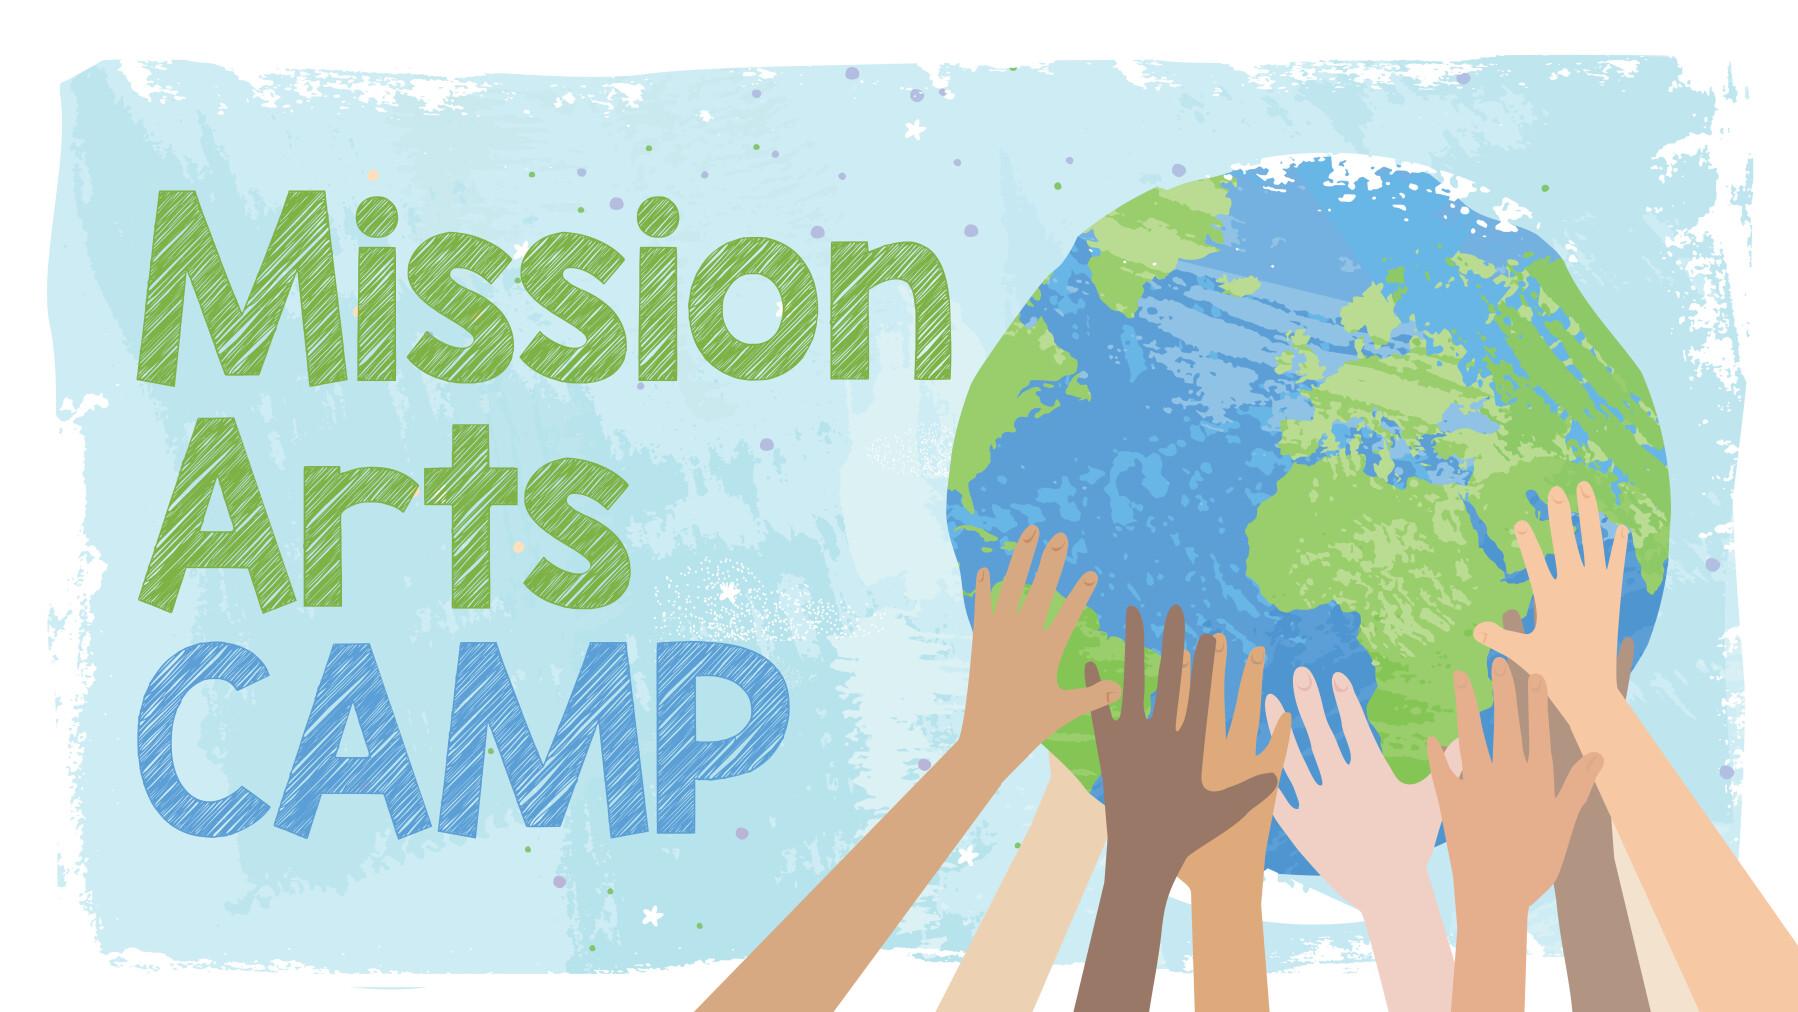 Mission Arts Camp